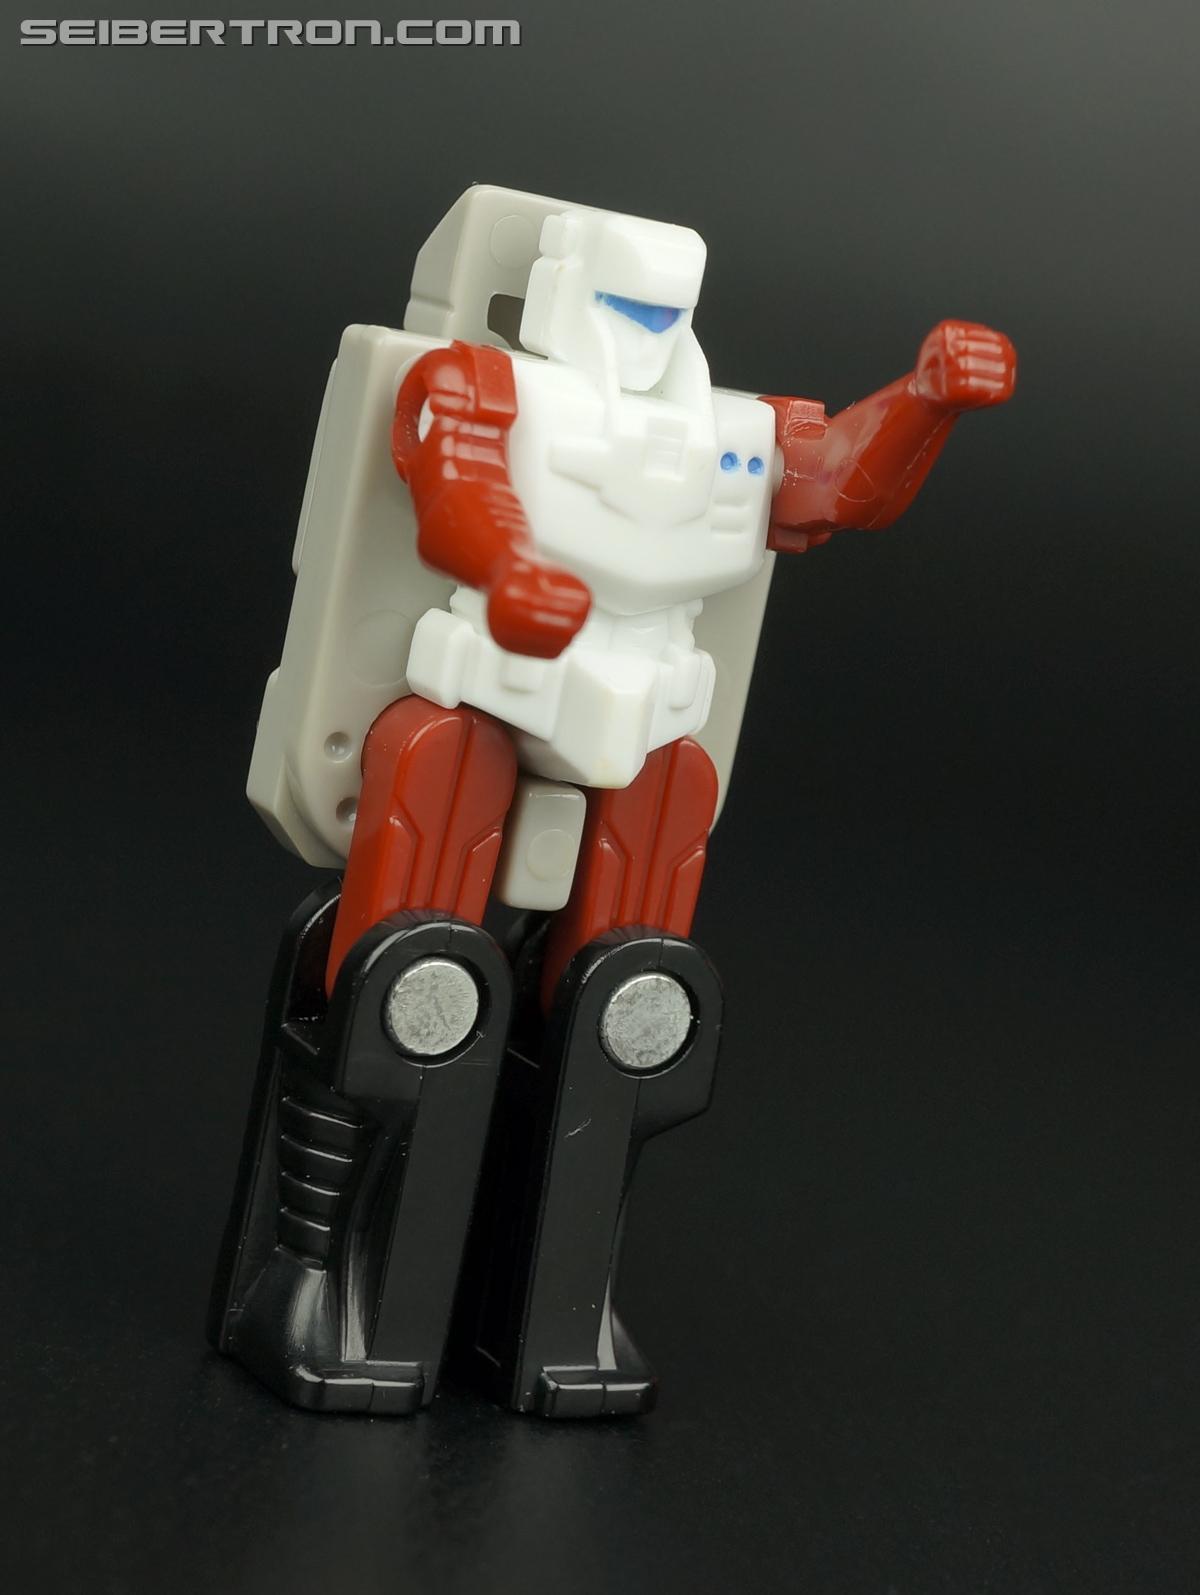 Transformers G1 1988 Hi-Q (Ginrai) (Image #64 of 76)